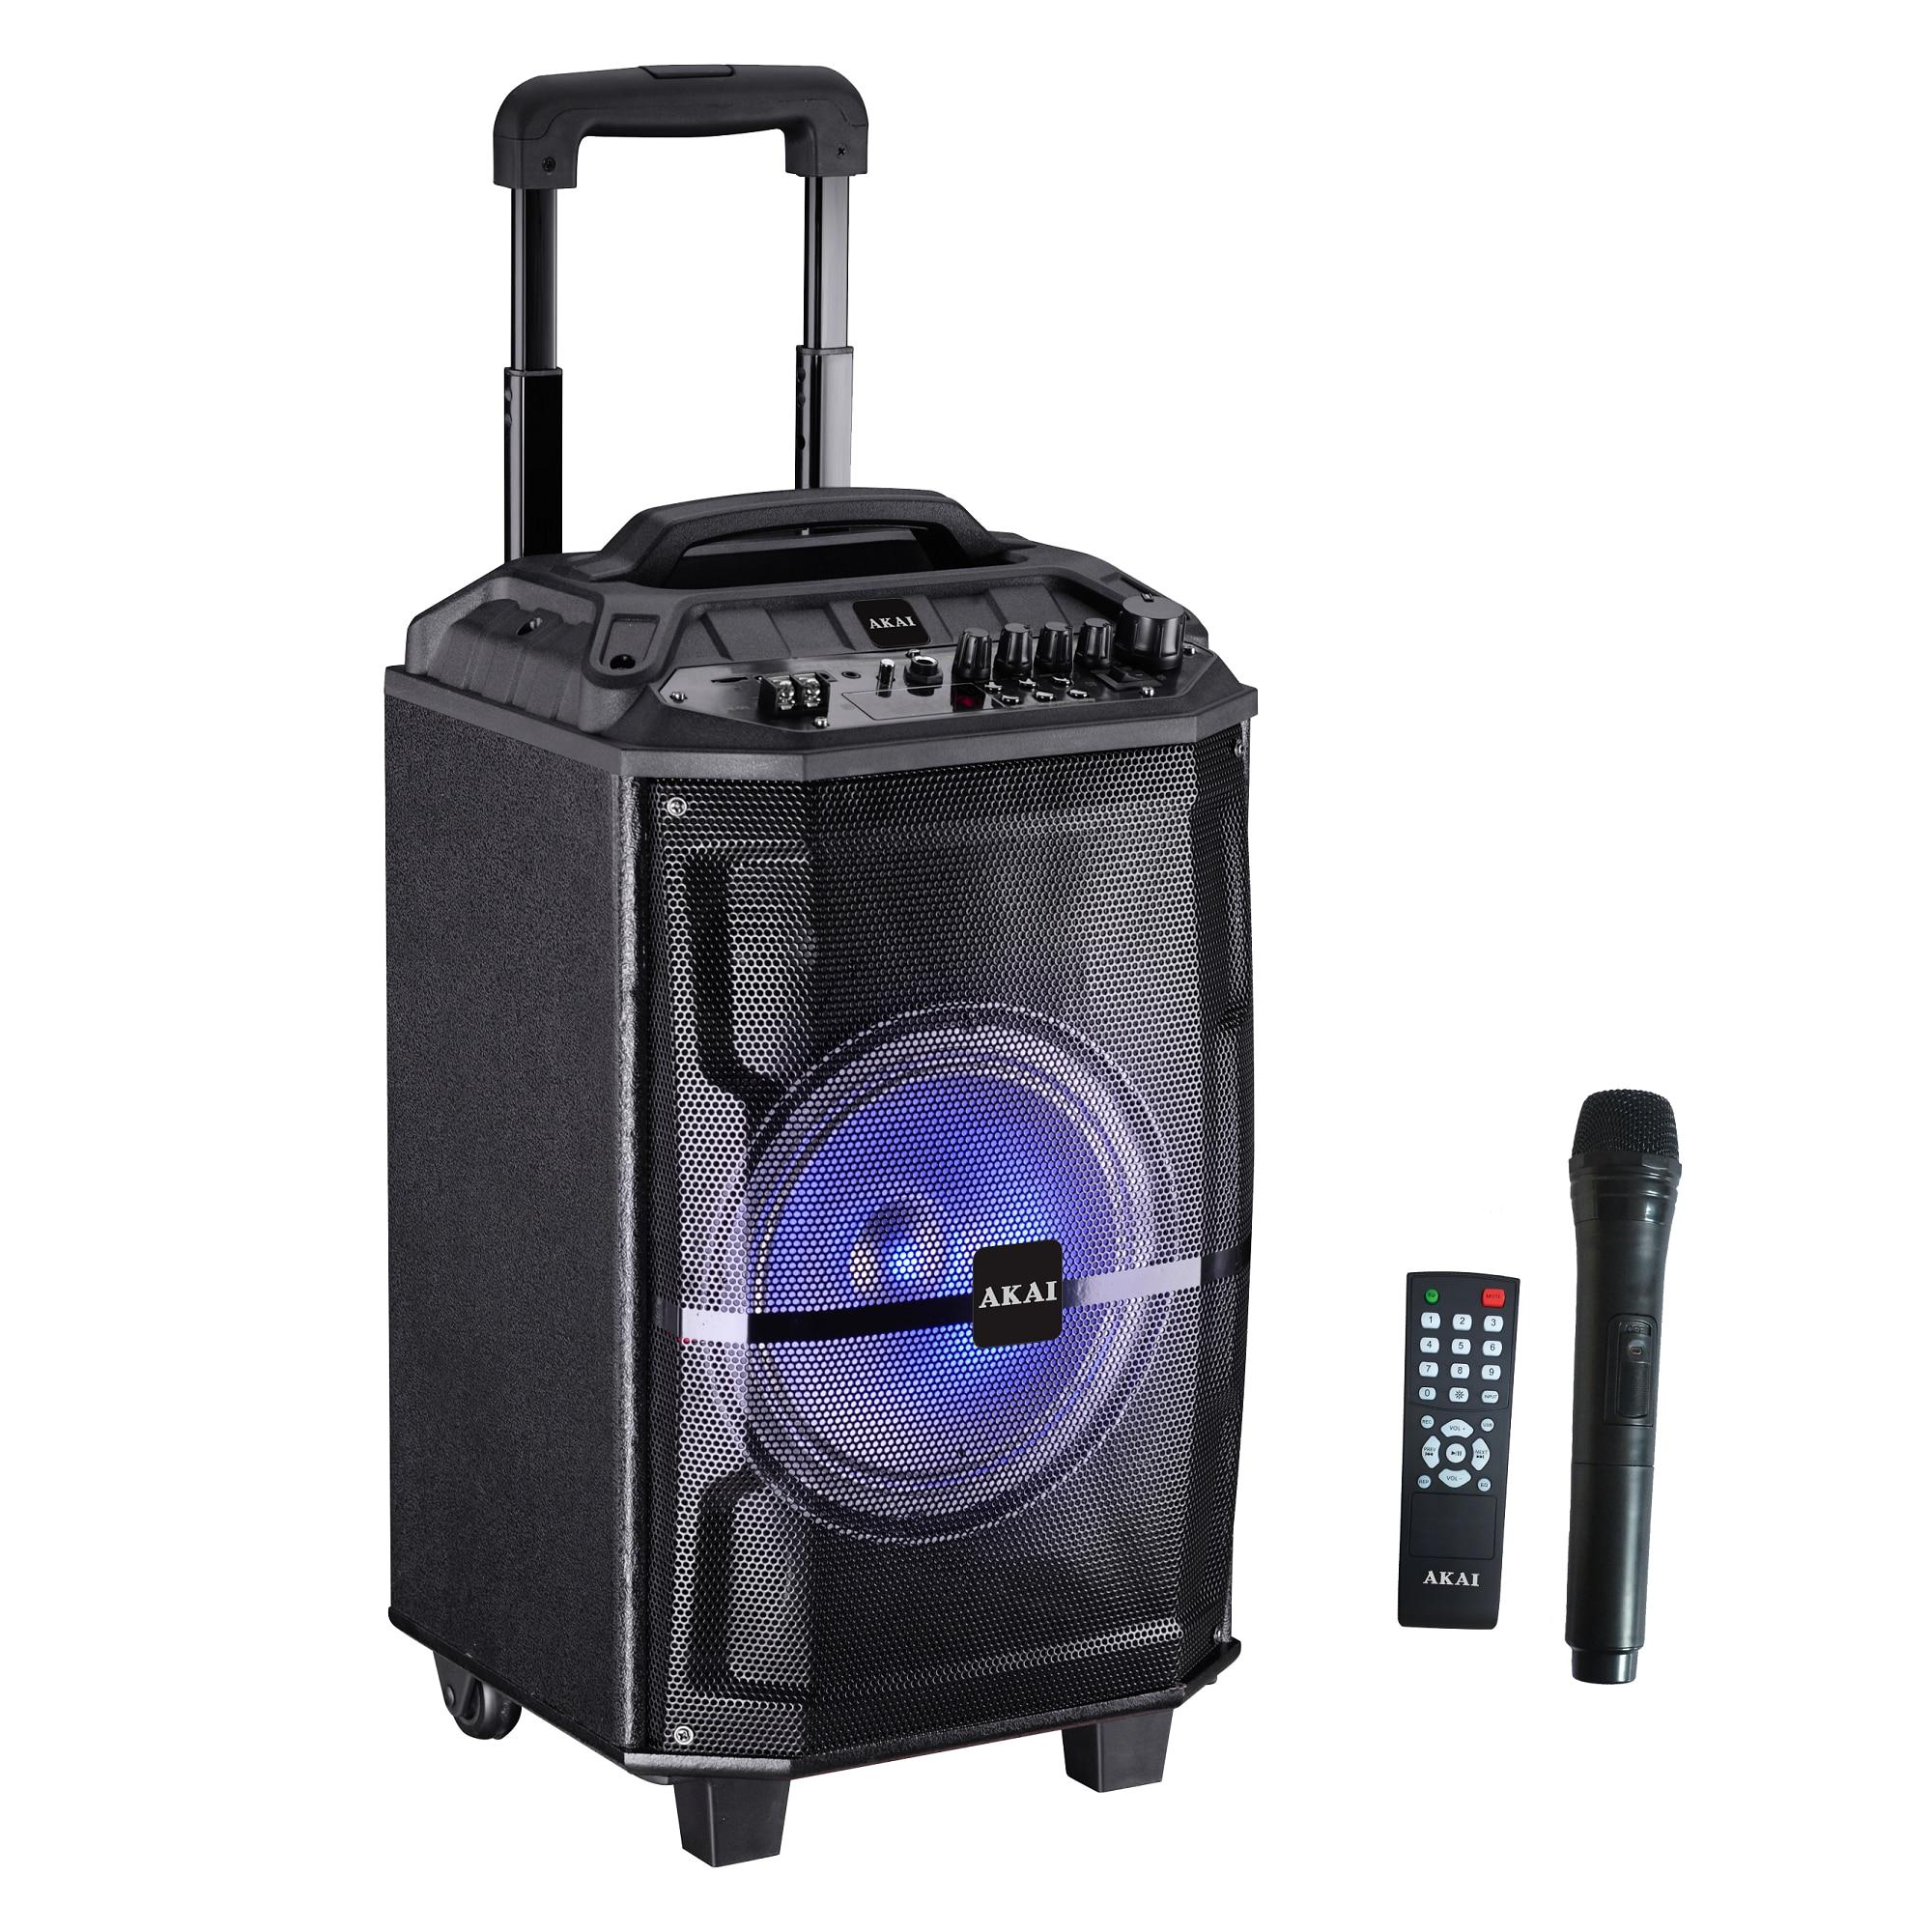 Fotografie Boxa portabila Akai ABTS-H12L, 40W, microfon wireless, Bluetooth, radio FM, karaoke, USB, lumini disco